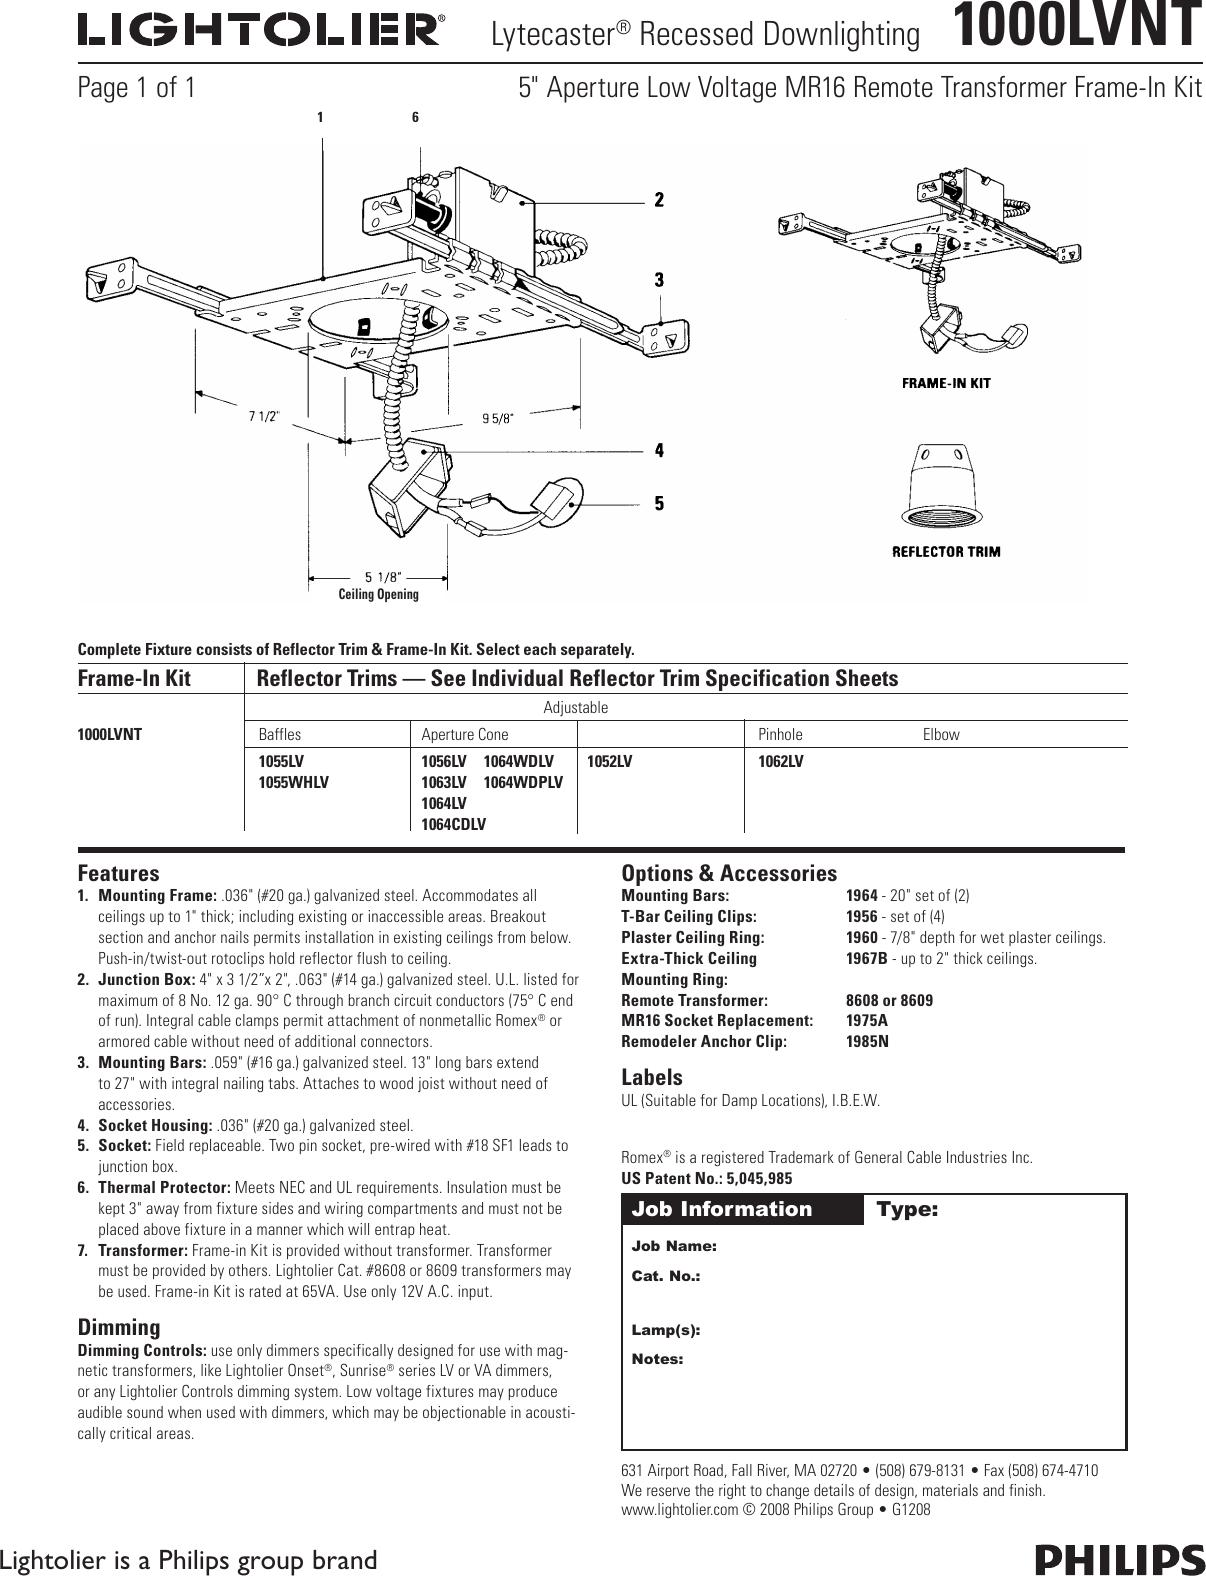 LightolierLytecasterRecessedDownlighting1000LvntUsersManual573167.823225906 User Guide Page 1 lightolier lytecaster recessed downlighting 1000lvnt users manual